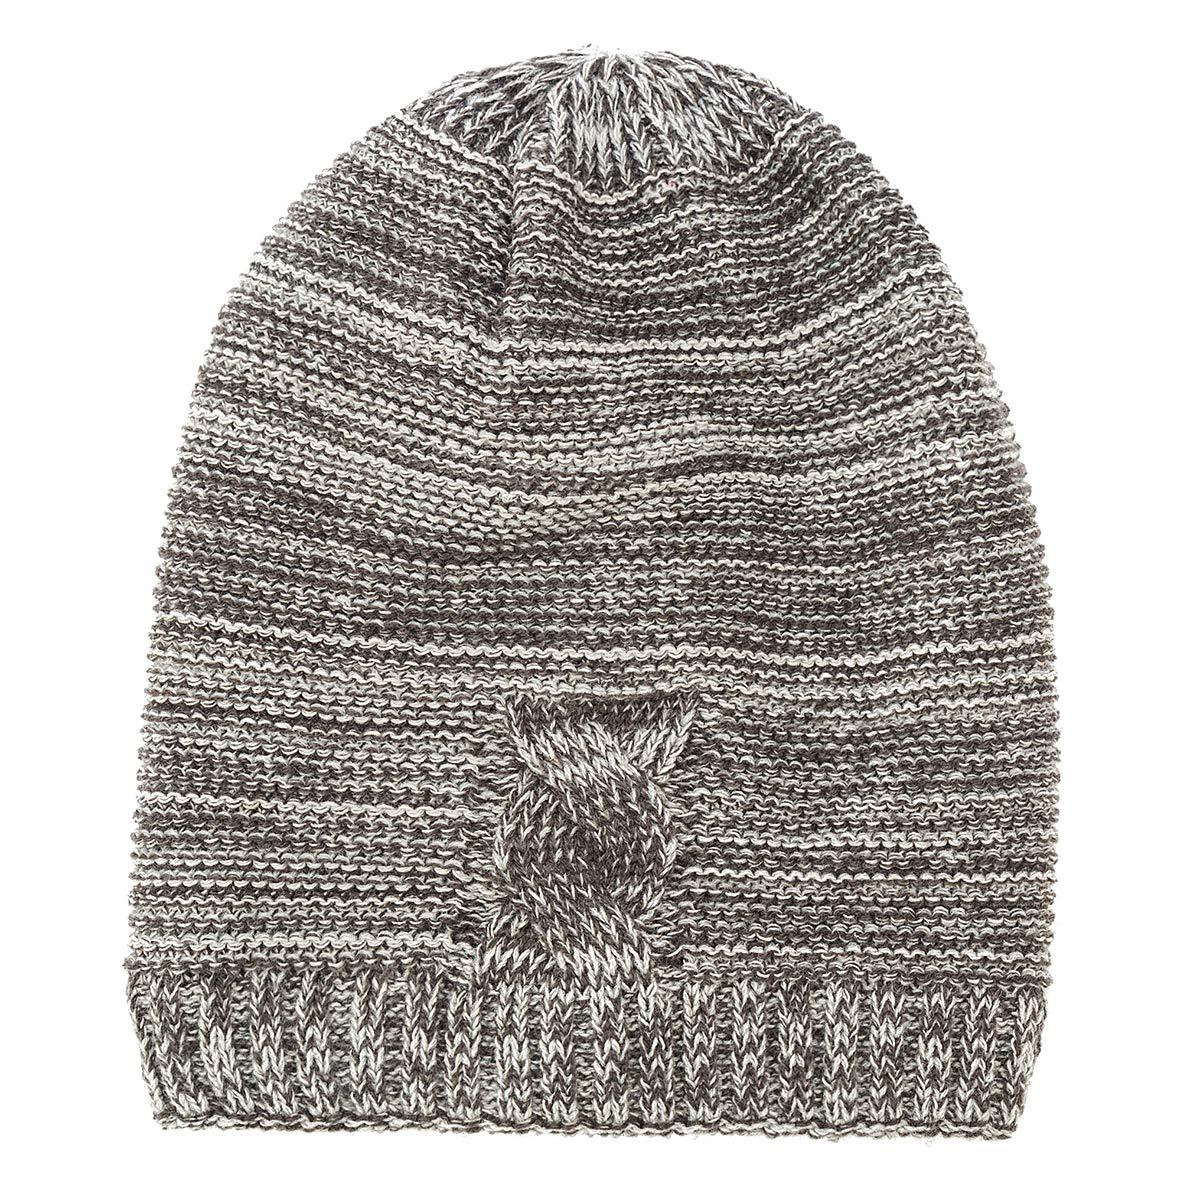 50213bf5fb34a9 Grey KAISHIN New Mens Fine Knit Hat Winter Winter Winter Outdoor Cap Fleece  Lined Beanie Hat Fashion Men Long Slouchy Hats 33d5e8